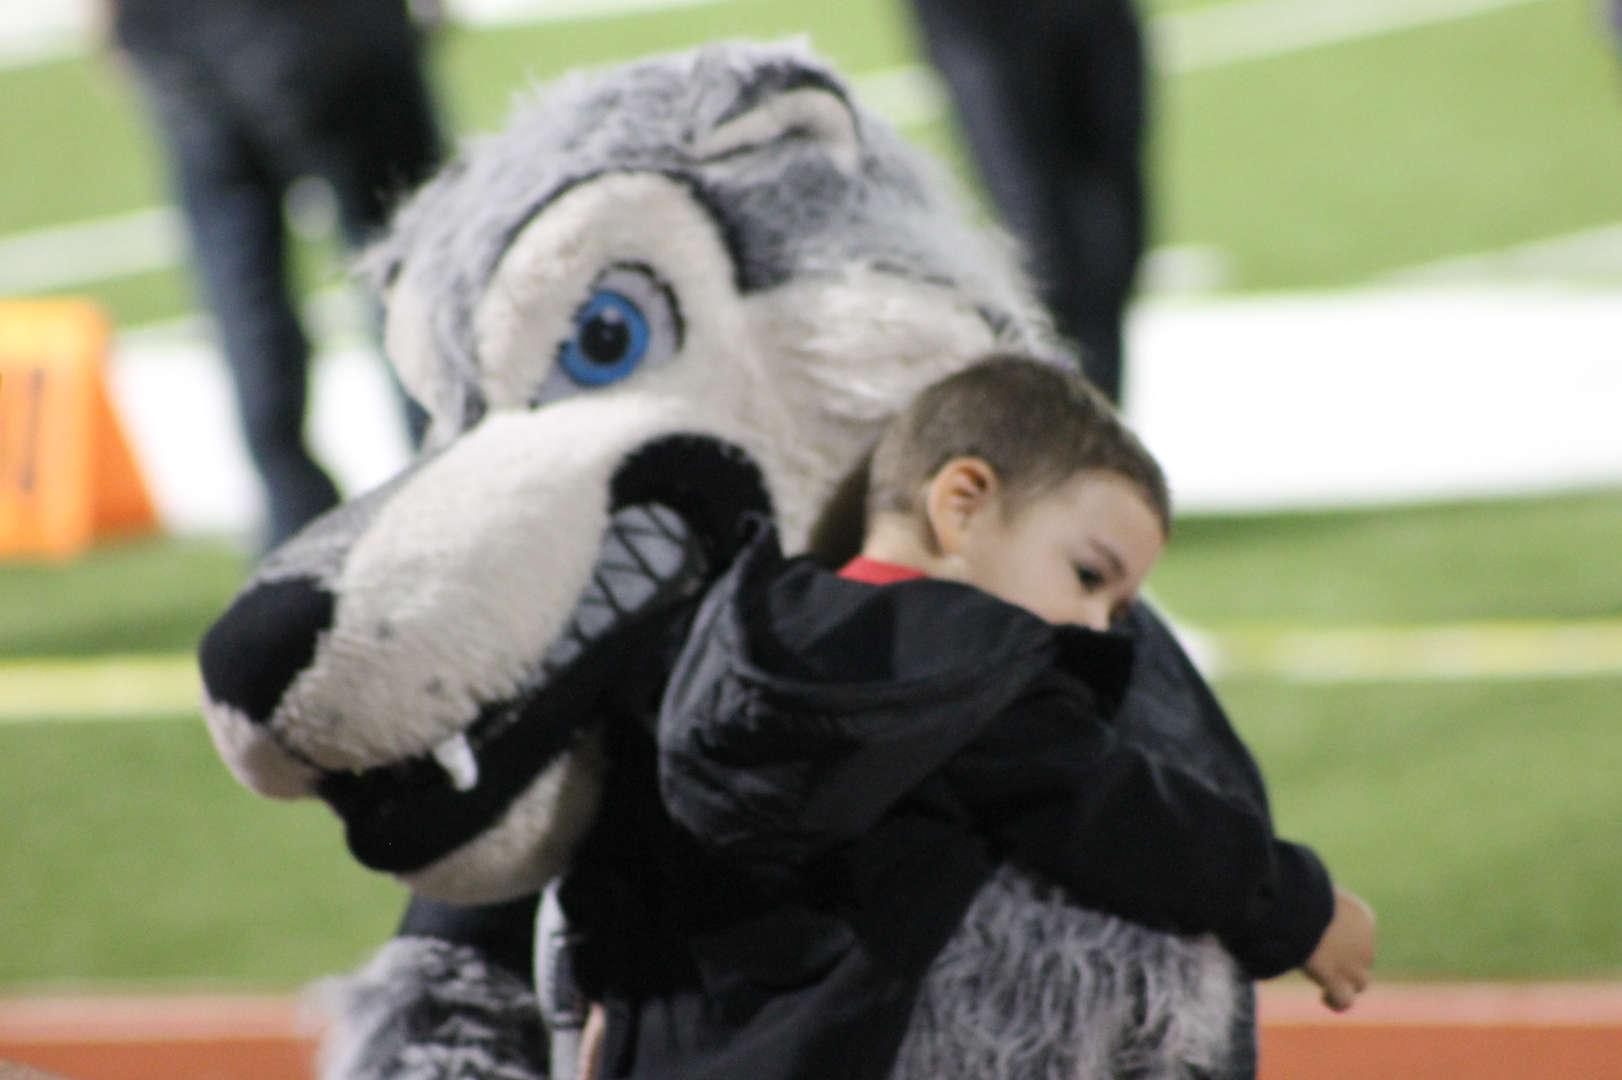 Lobo's mascot hugging a kid